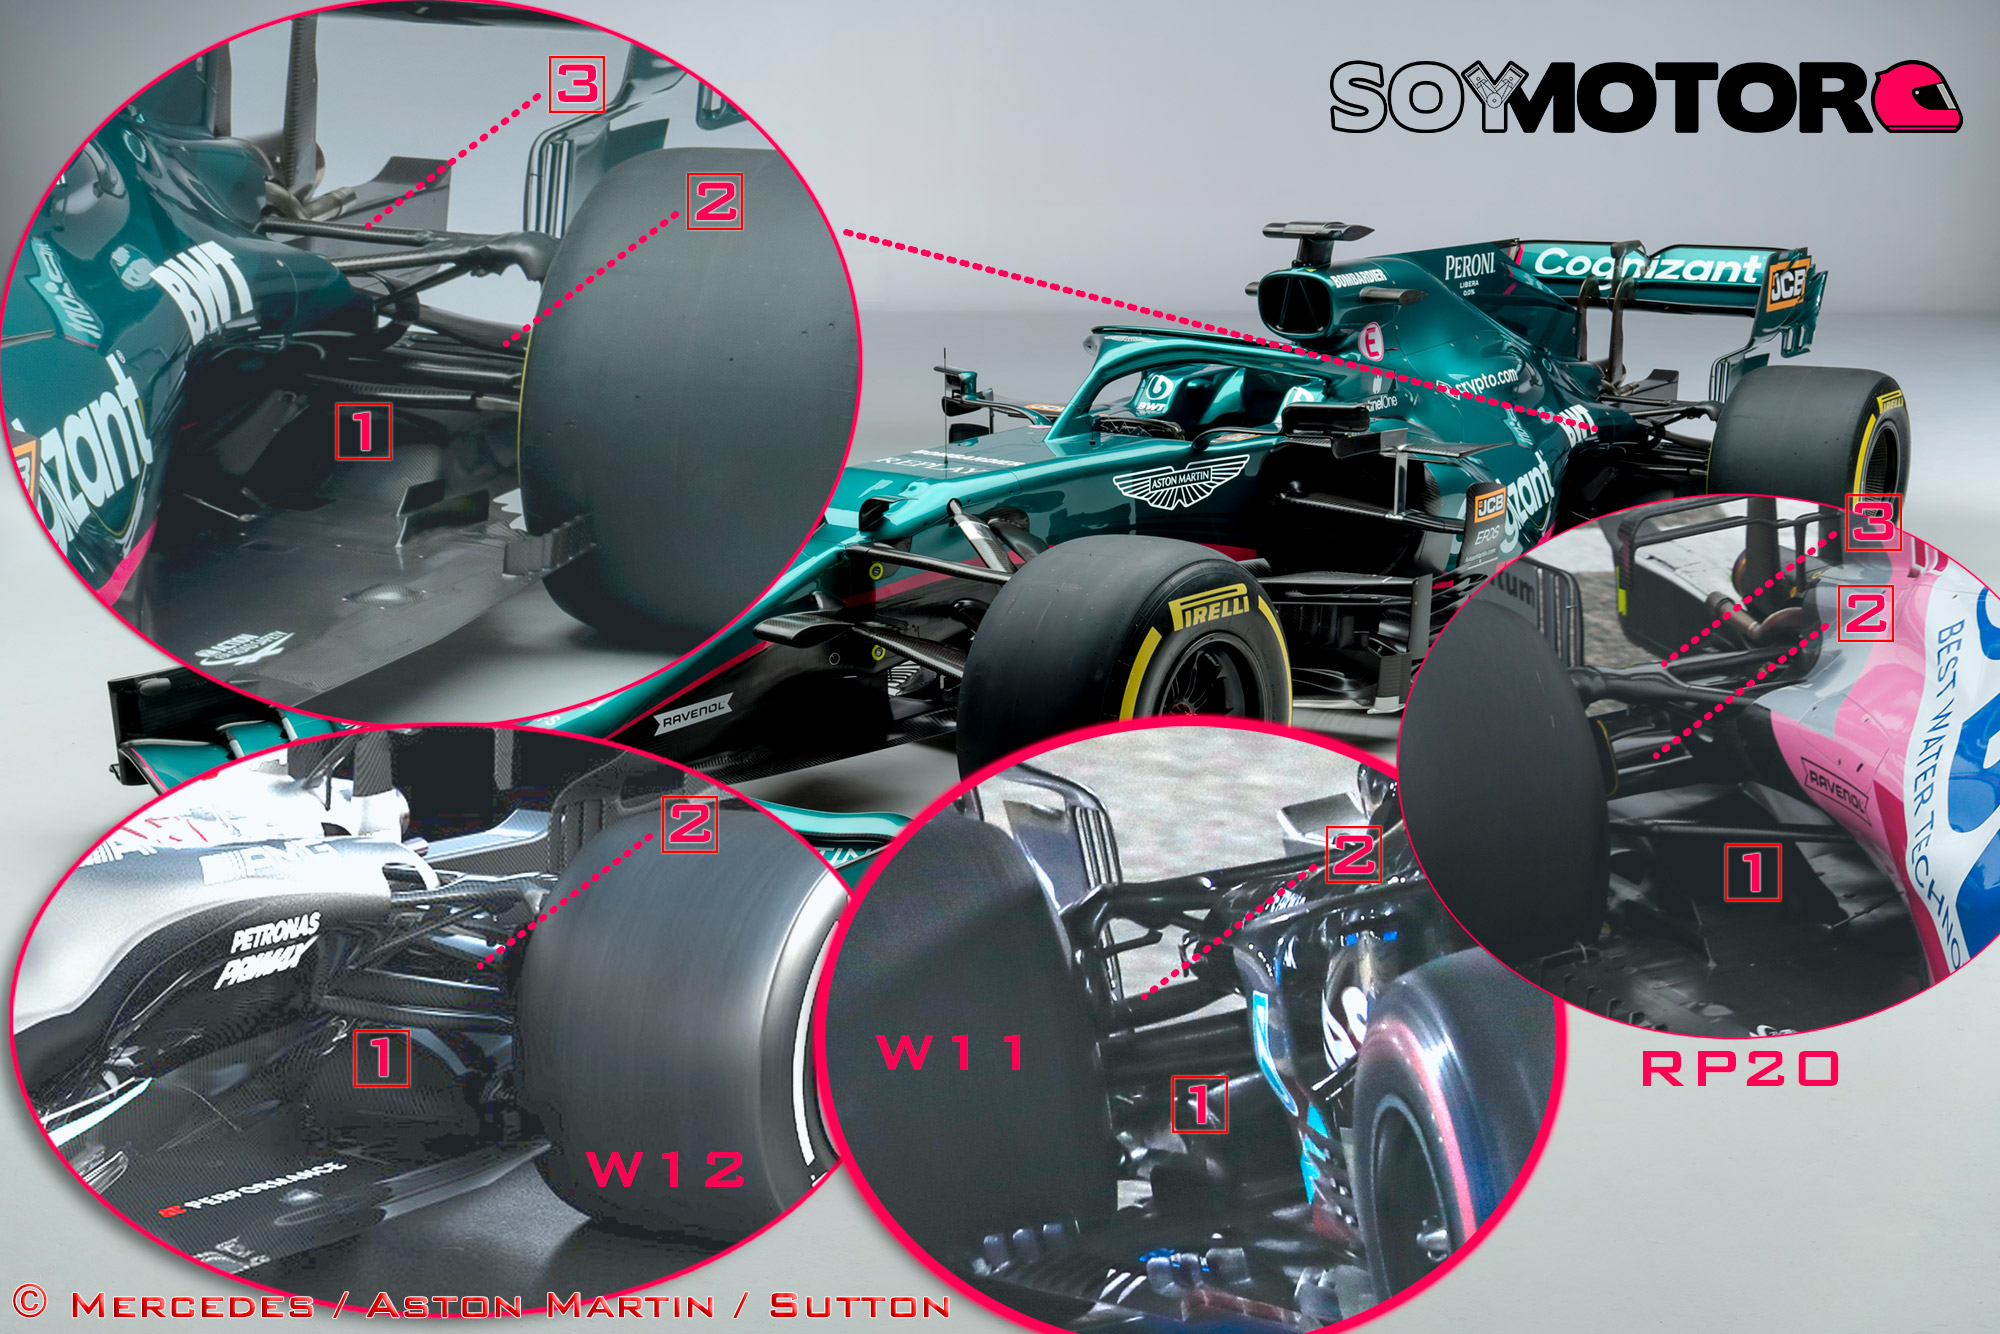 amr21-w11-12-suspension-trasera-soymotor.jpg